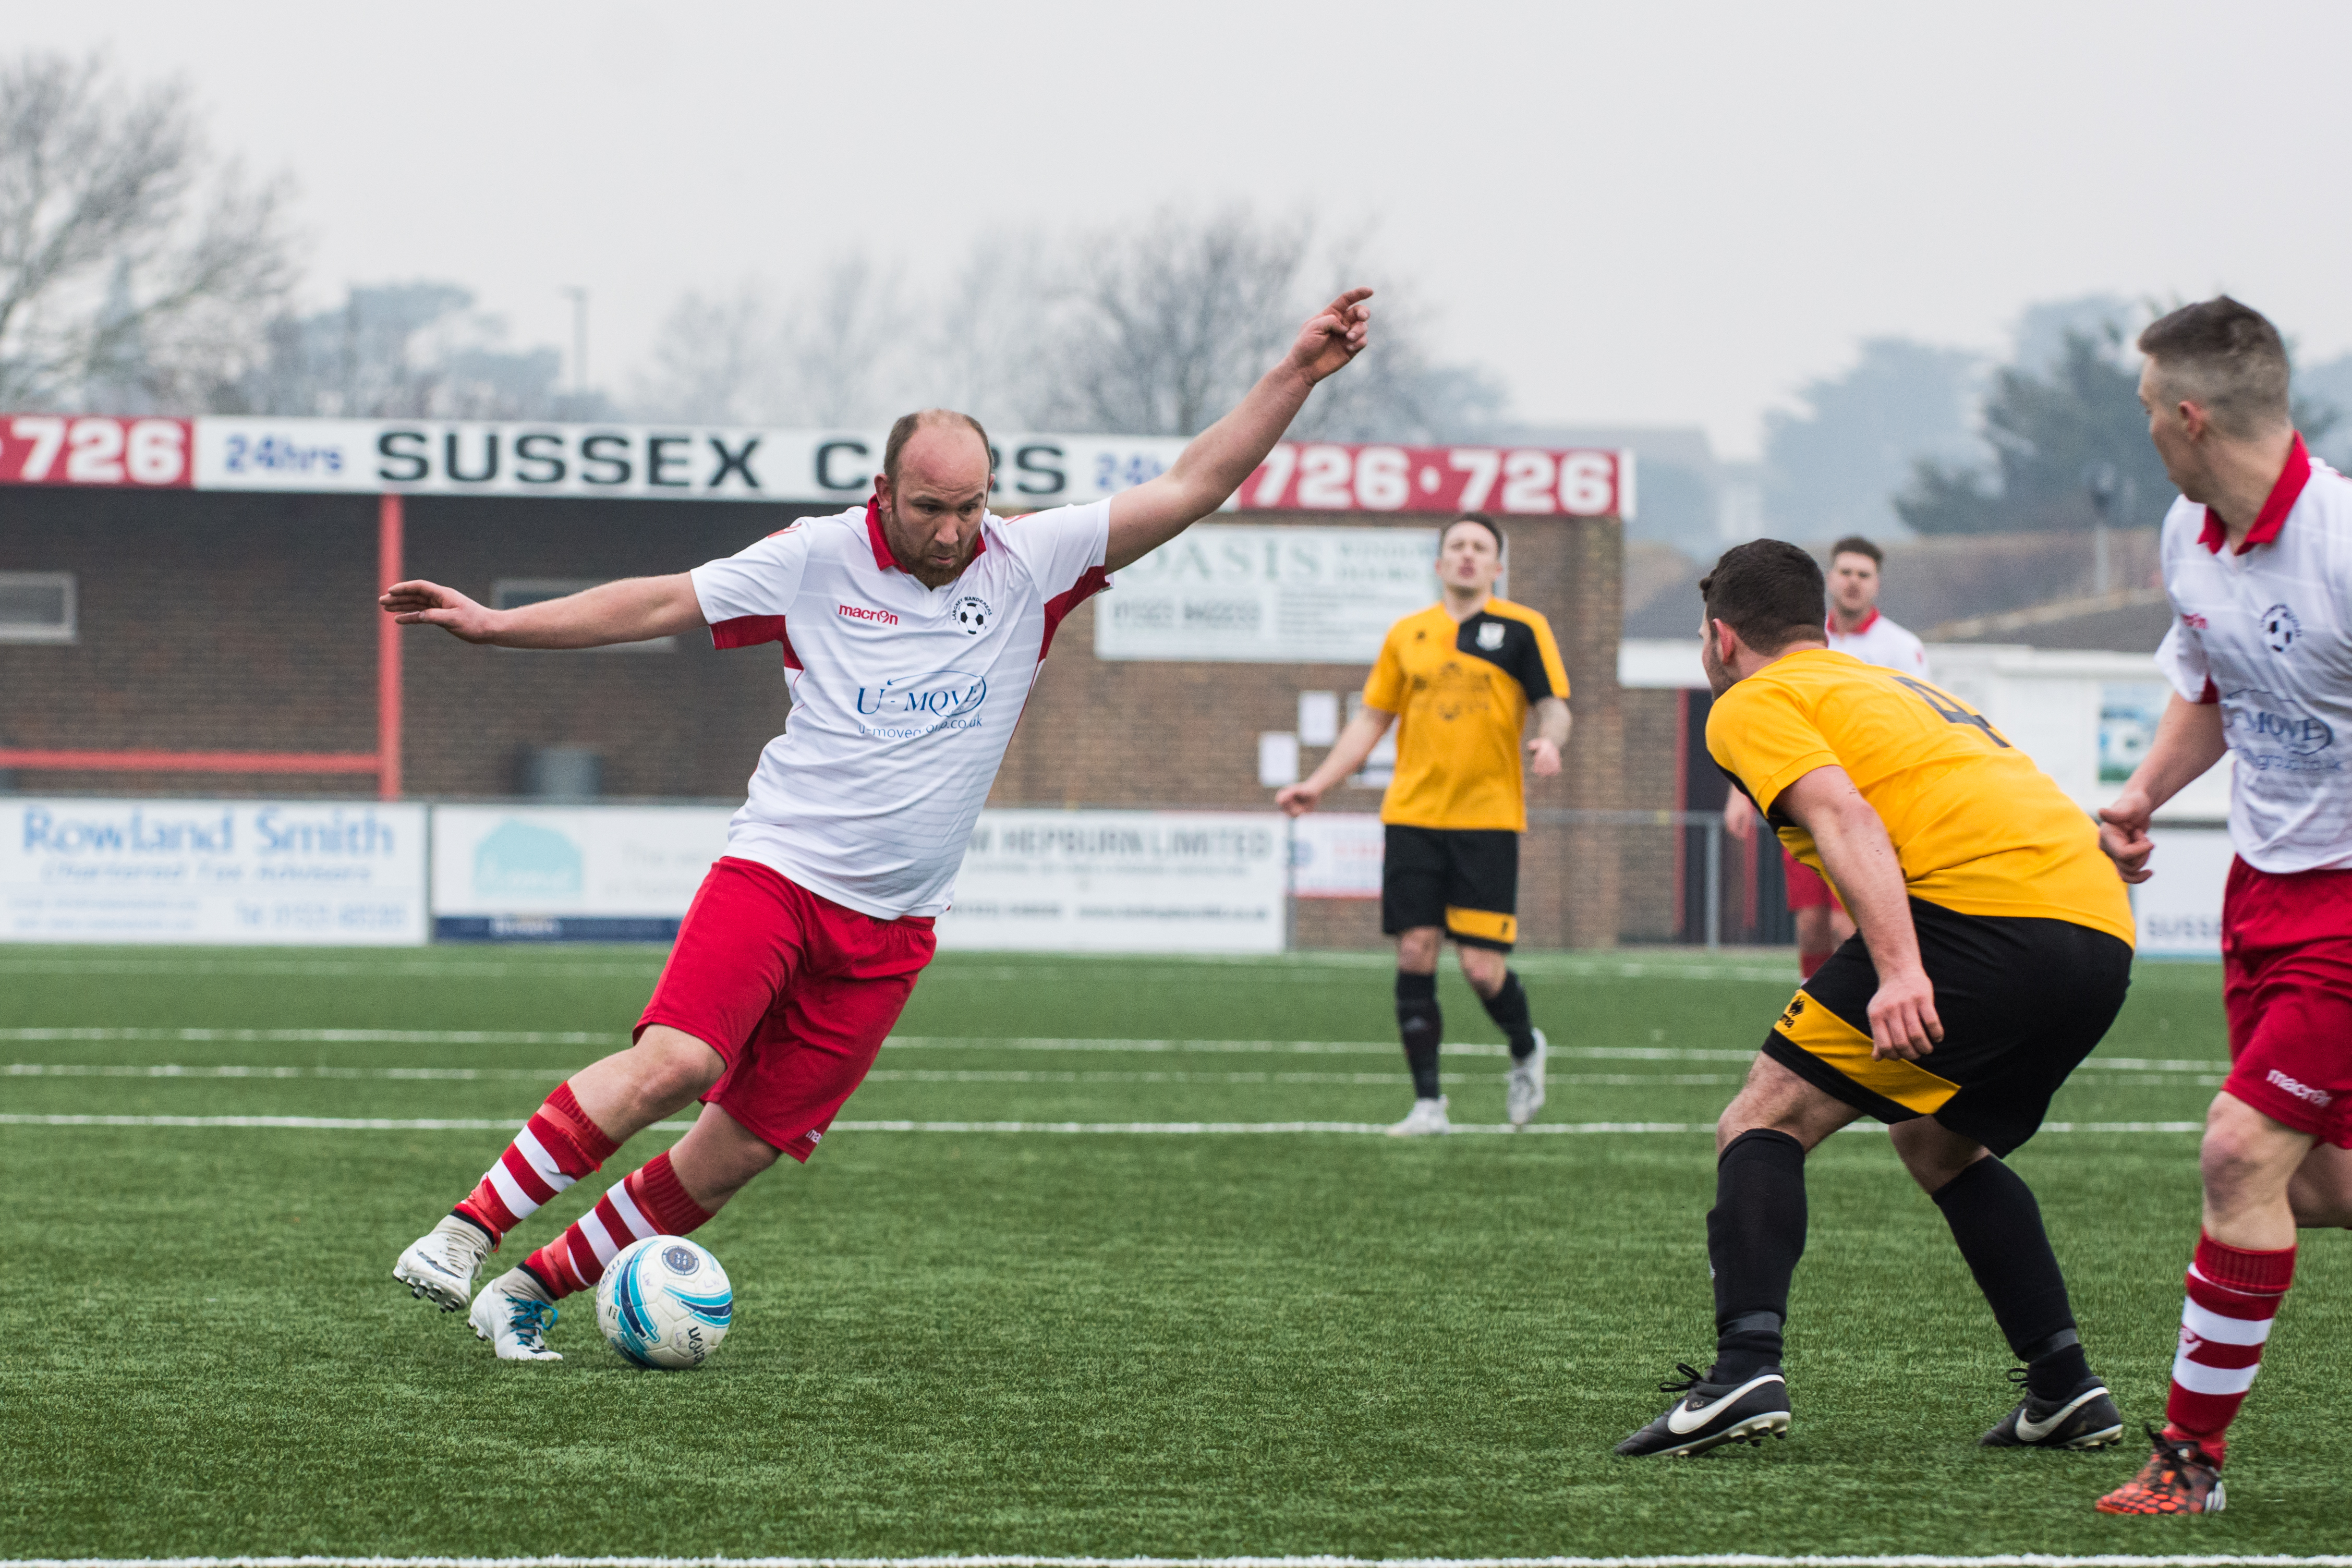 DAVID_JEFFERY Langney Wanderers FC vs Bexhill United FC 03.03.18 50